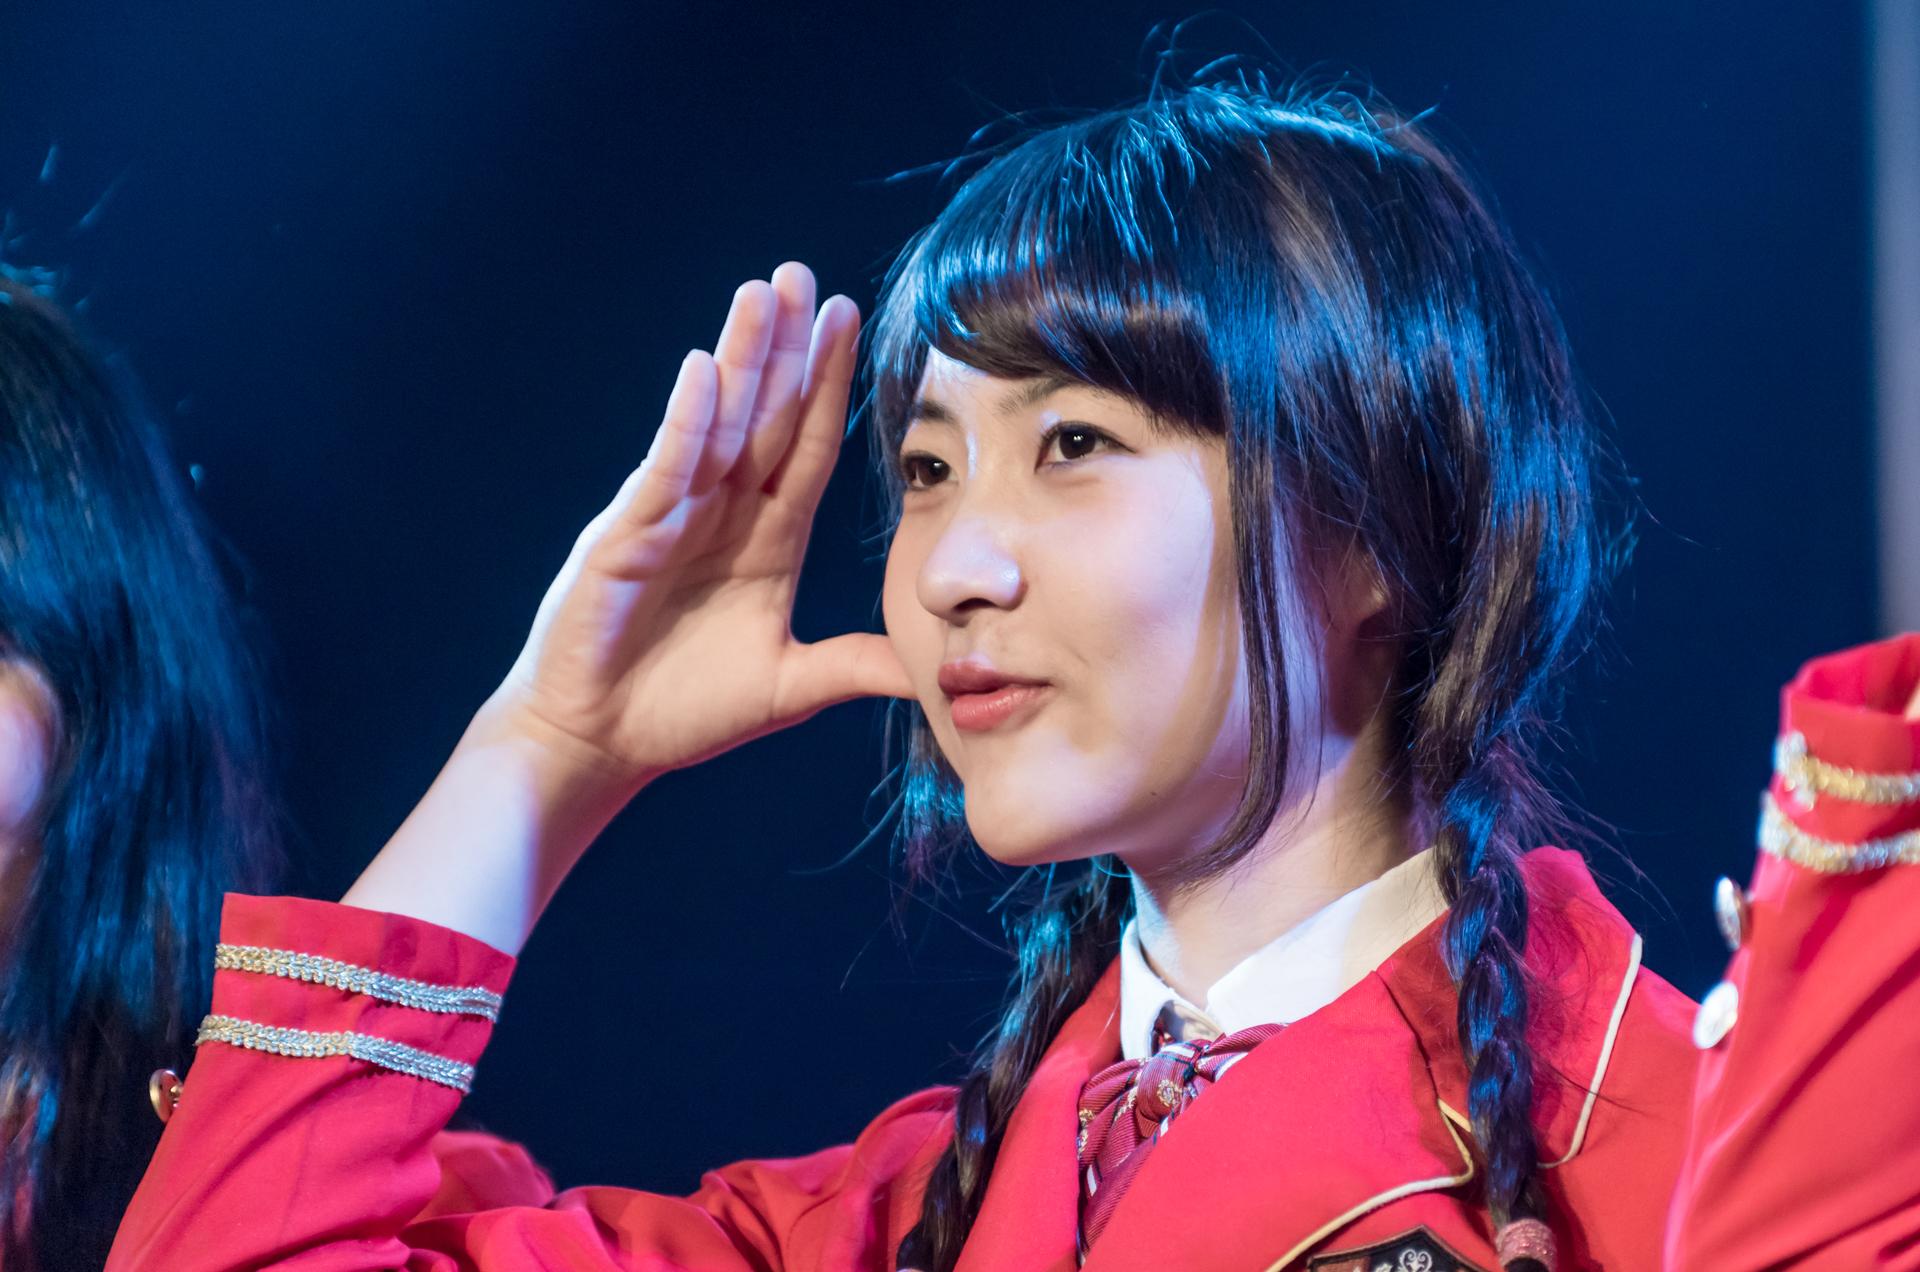 Teamくれれっ娘! 藤元志帆 | クレレコアイドル見本市